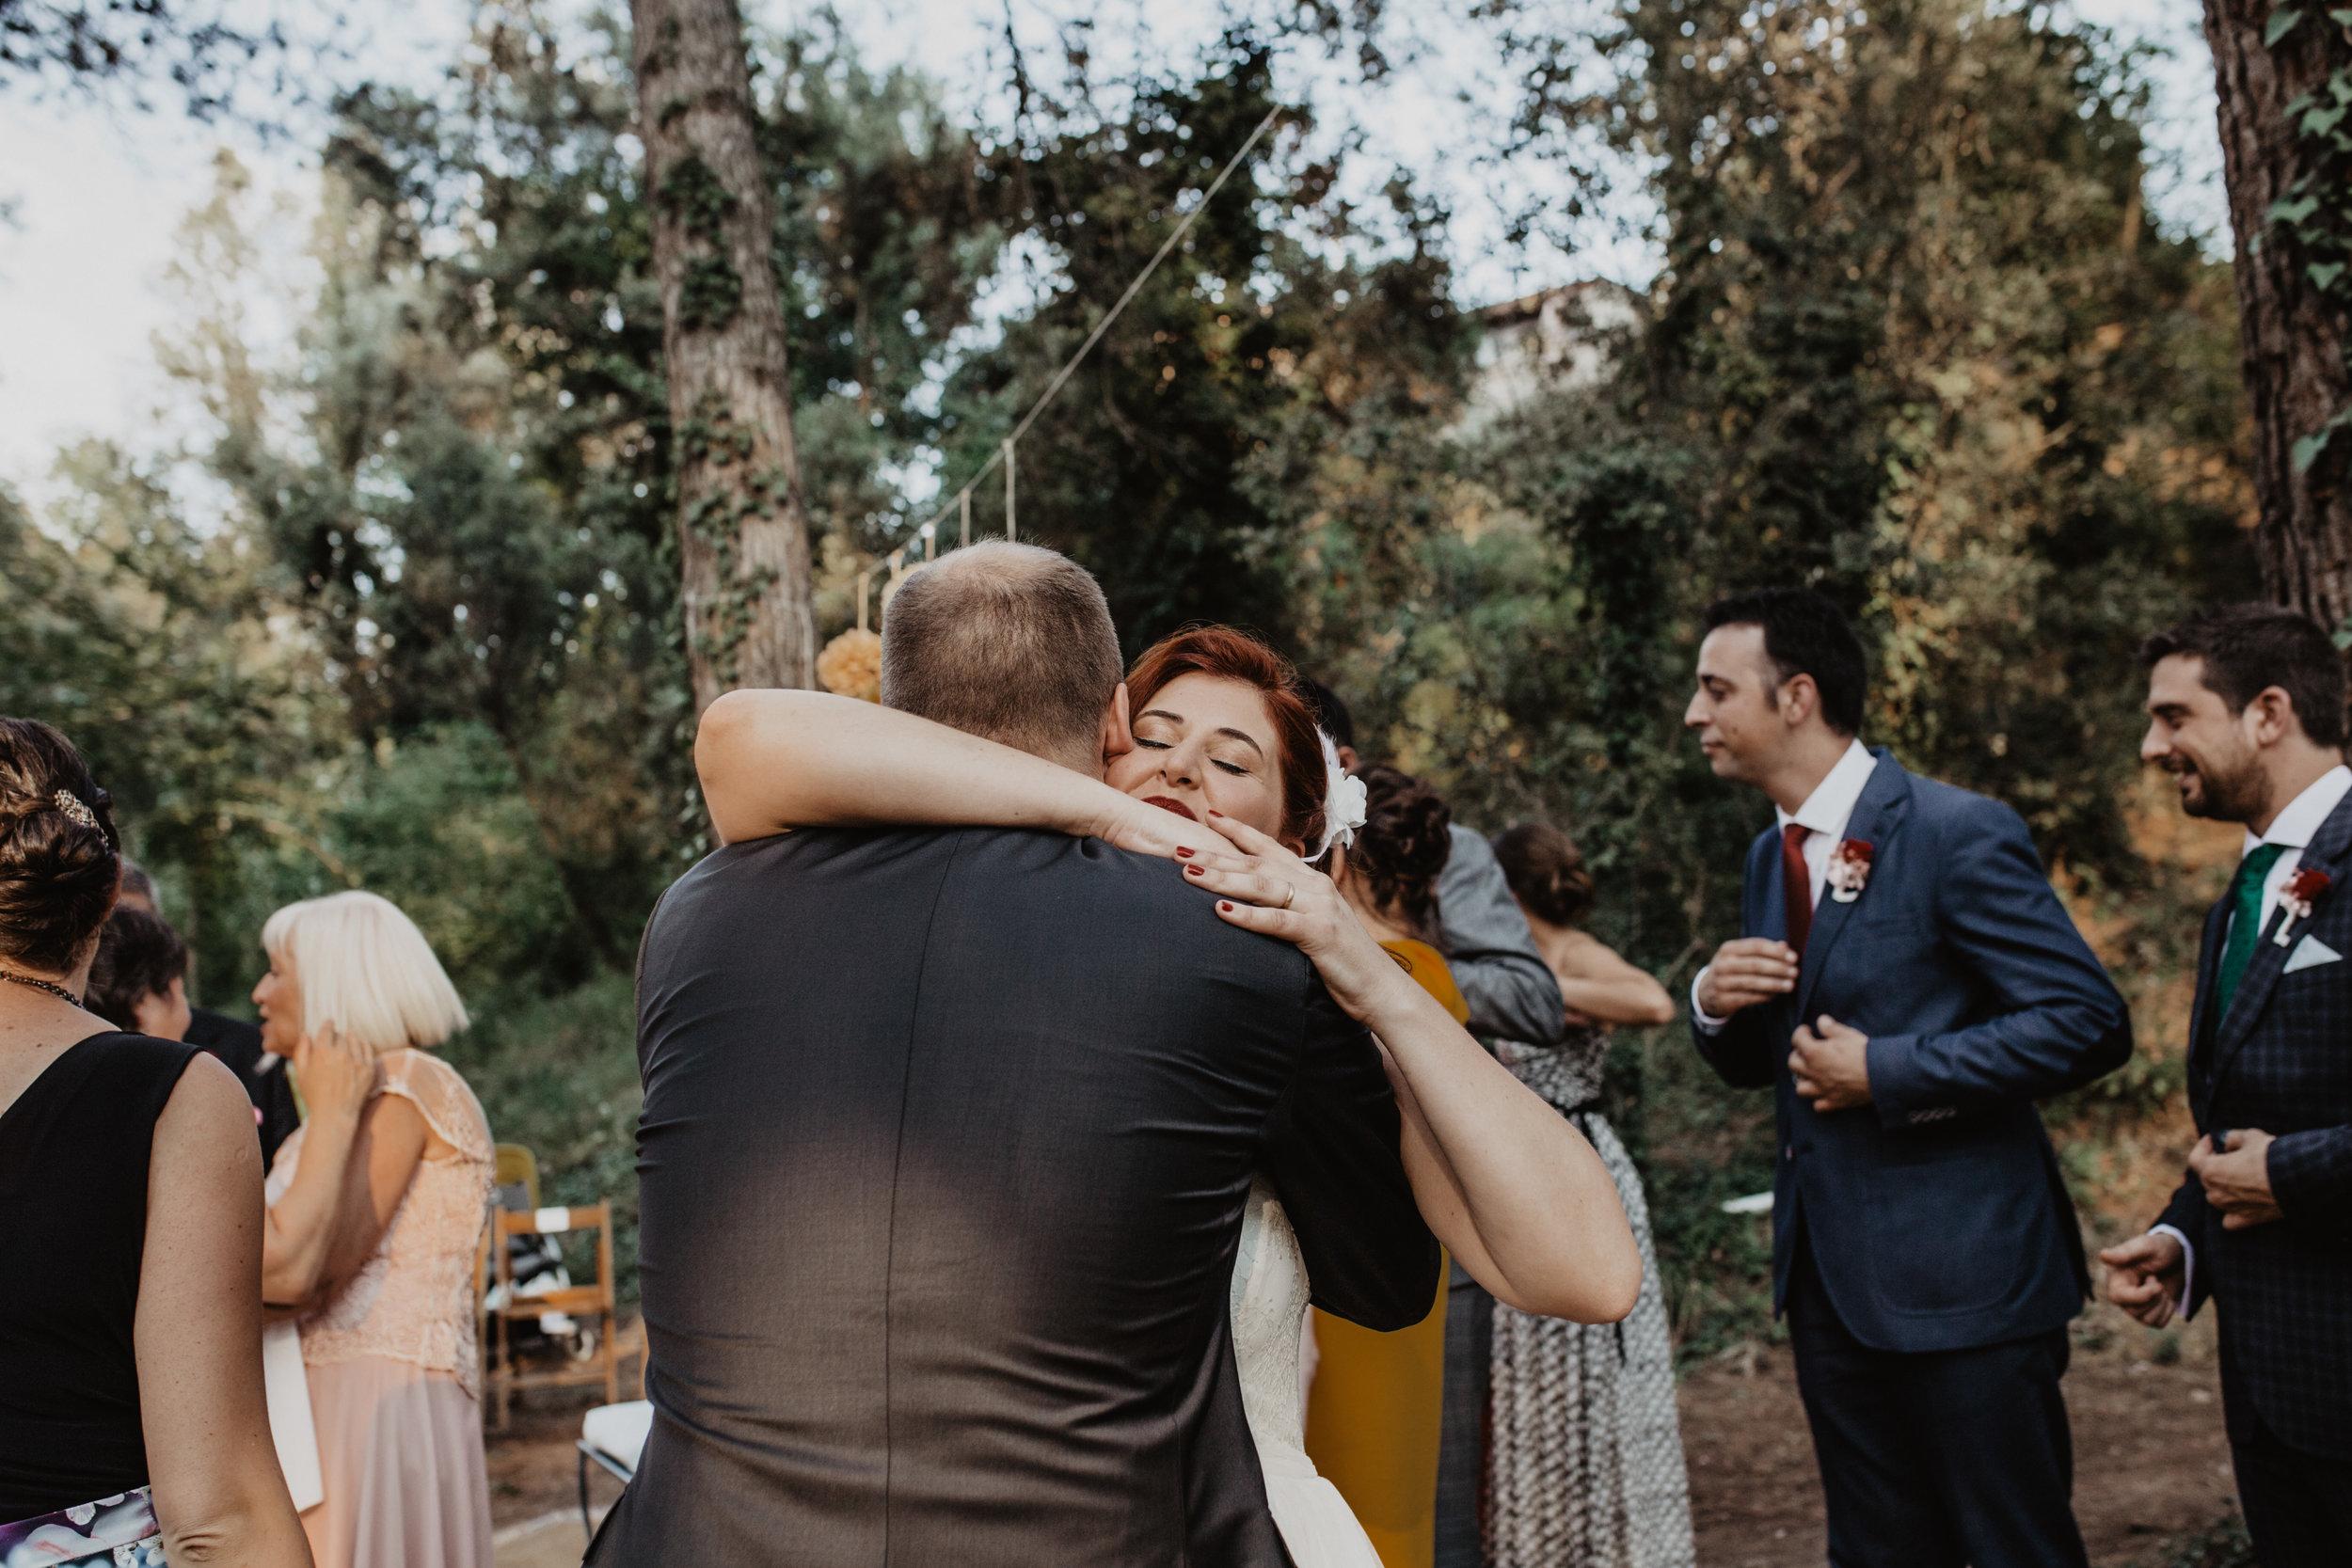 thenortherngirlphotography_photography_thenortherngirl_rebeccascabros_wedding_weddingphotography_masialagarrigadecastelladral_joaniemma_bodaenbarcelona_weddingphotographer_emmaijoan-424.jpg